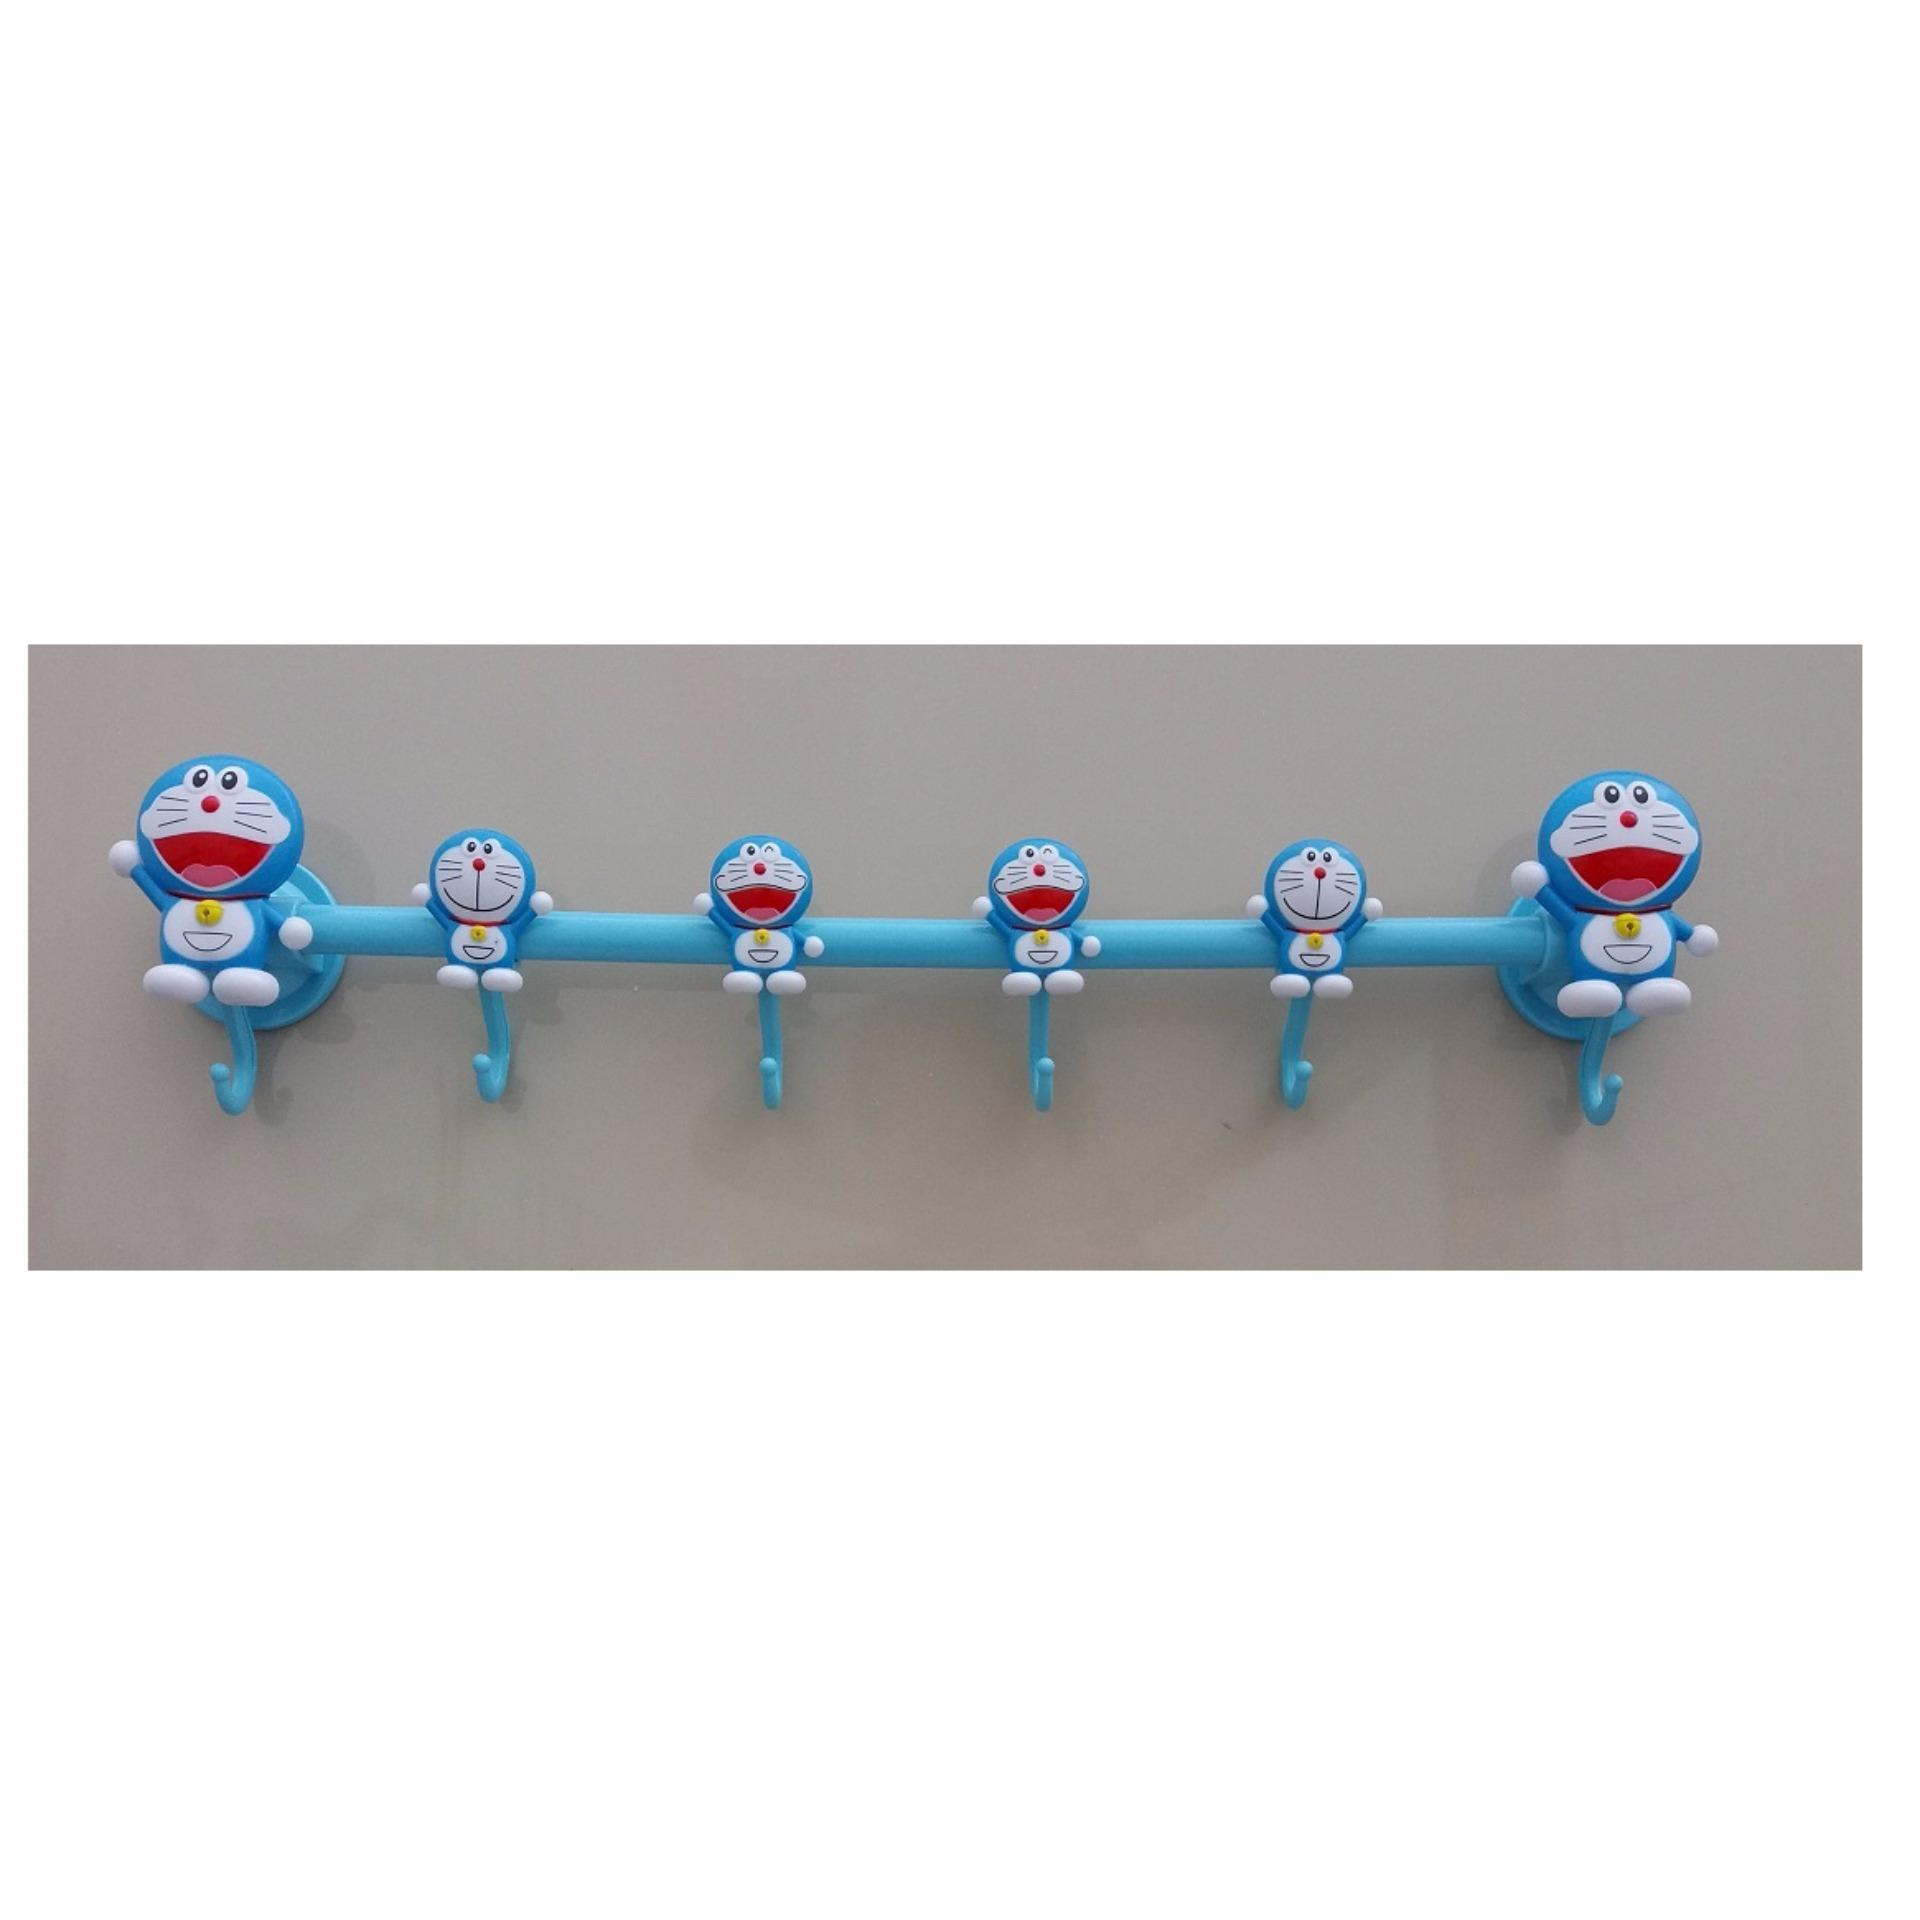 Doraemon Karakter Gantungan Baju 6 Slot